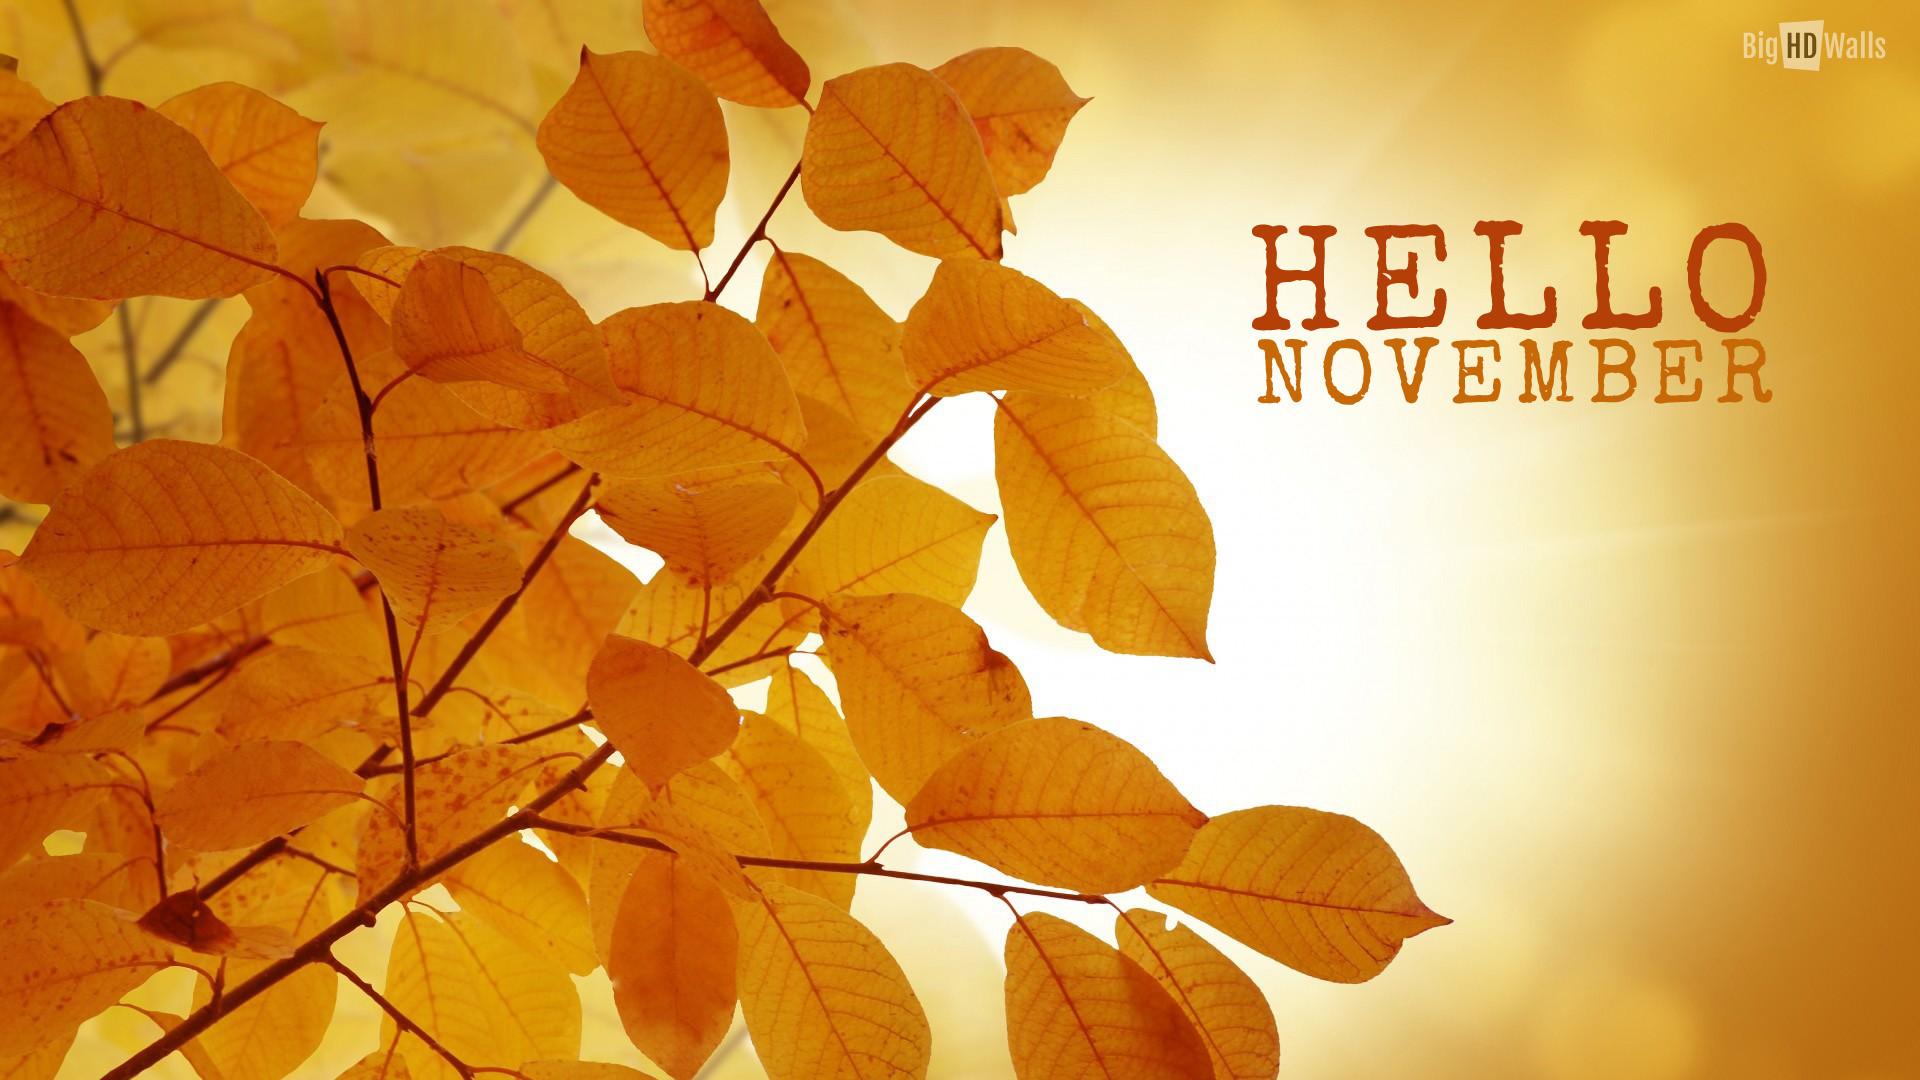 November wallpaper